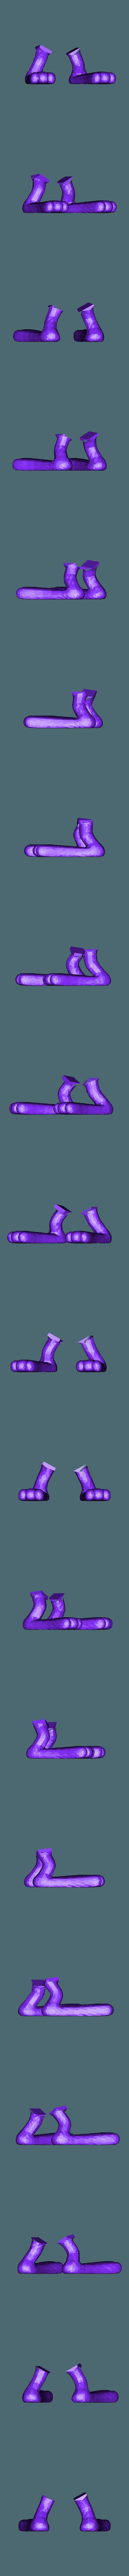 Meowth_feet.obj Download free OBJ file Life-Sized Meowth • 3D print model, JayOmega